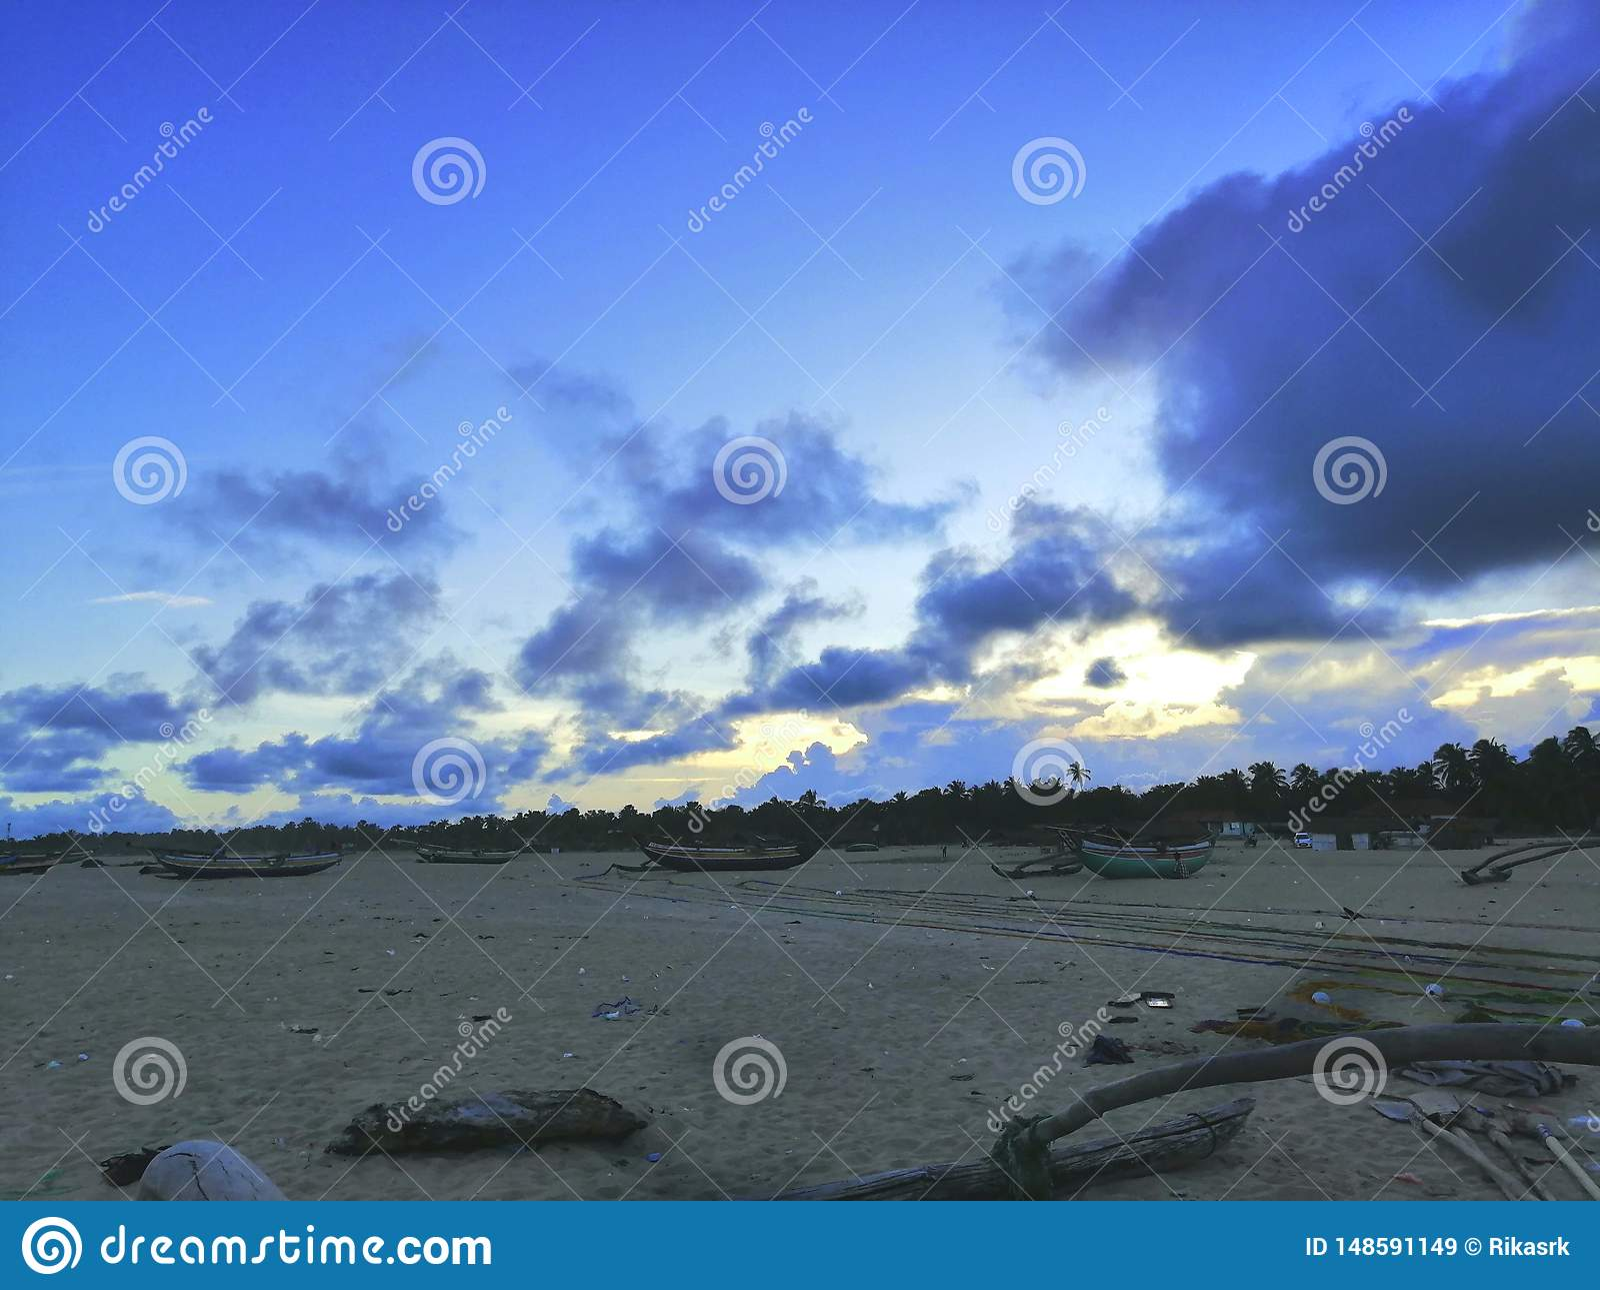 Landskapsikten av stranden